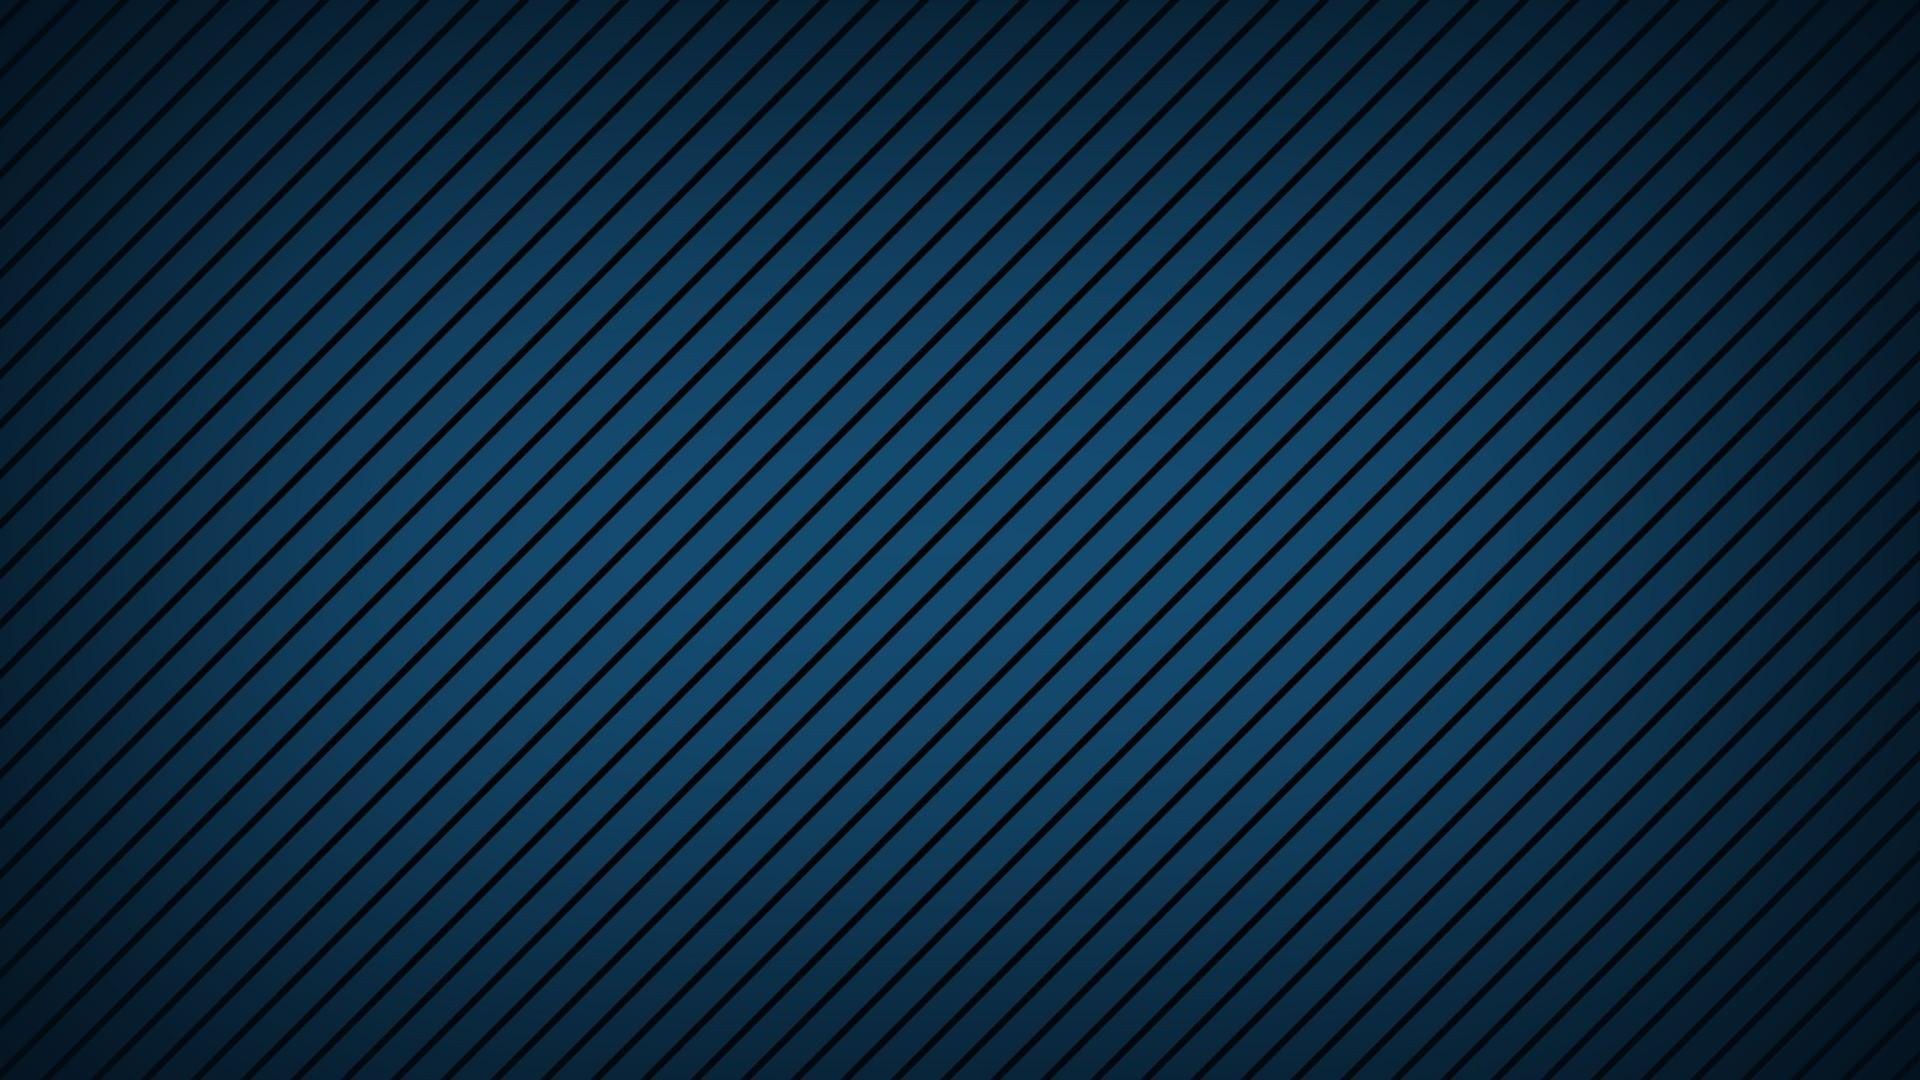 Desktop wallpaper pattern 64 images - Hd pattern wallpapers 1080p ...